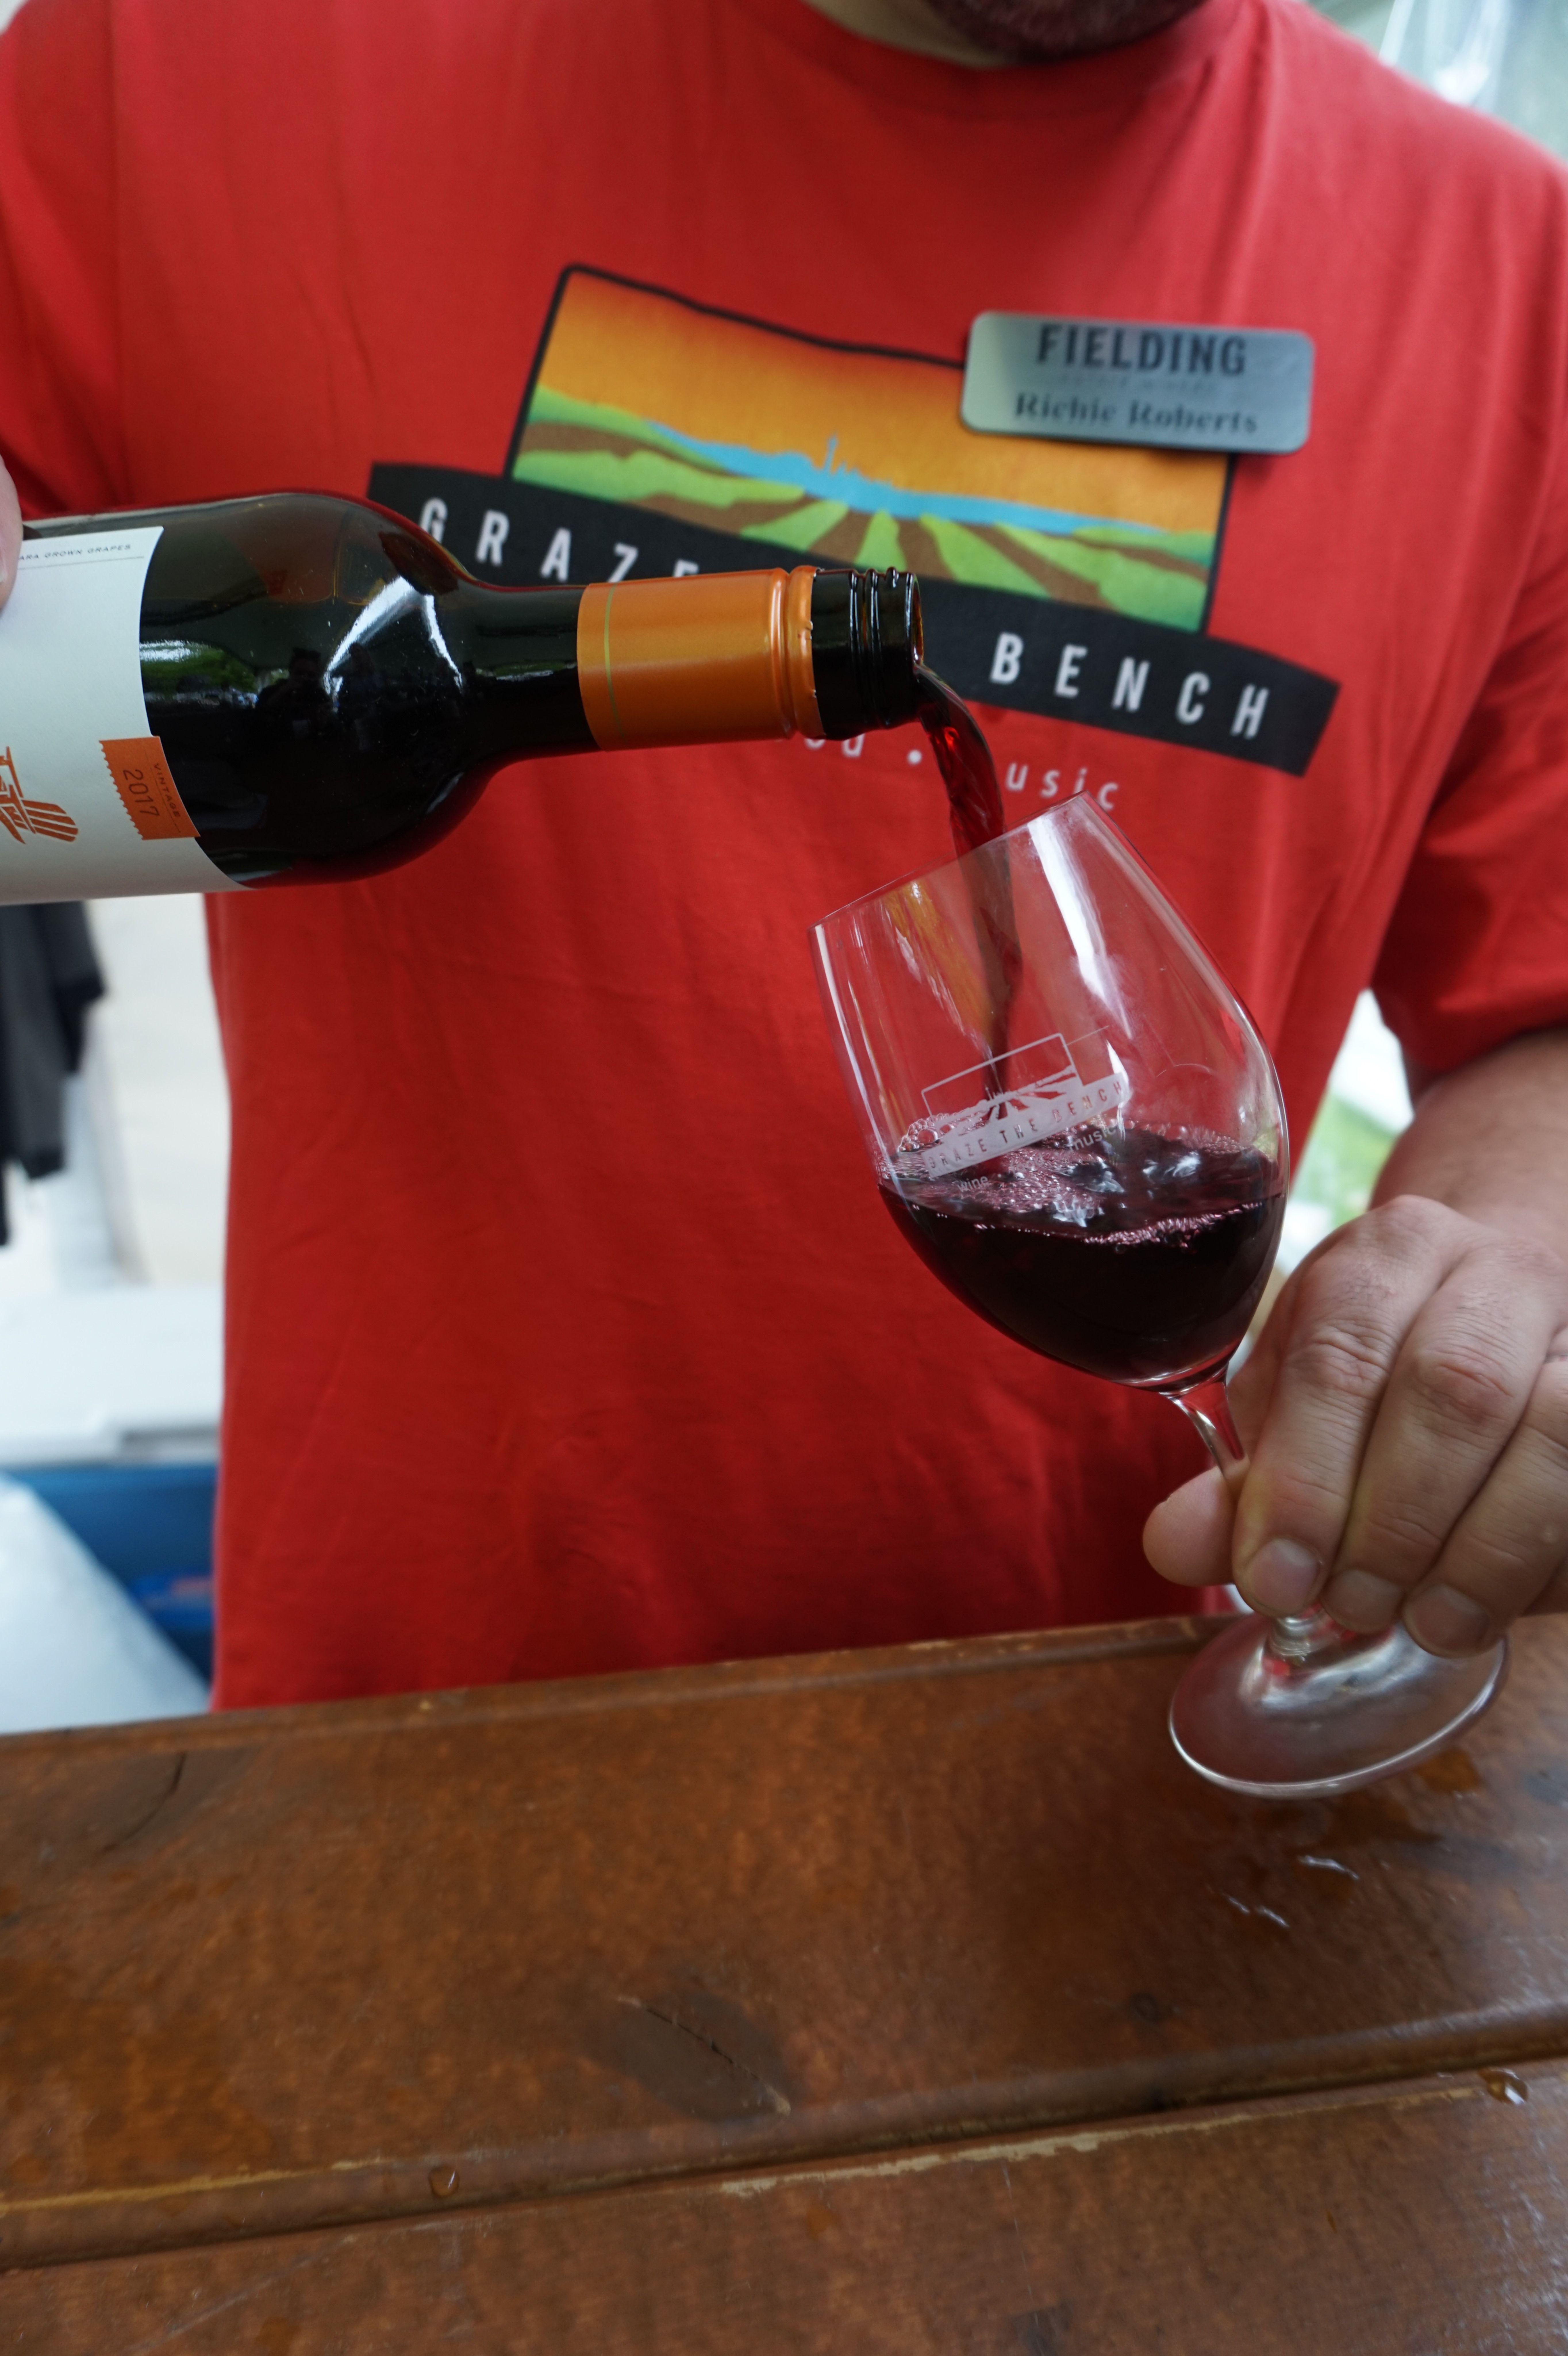 Niagara Wine Events Graze The Bench Wine Event Niagara Wine